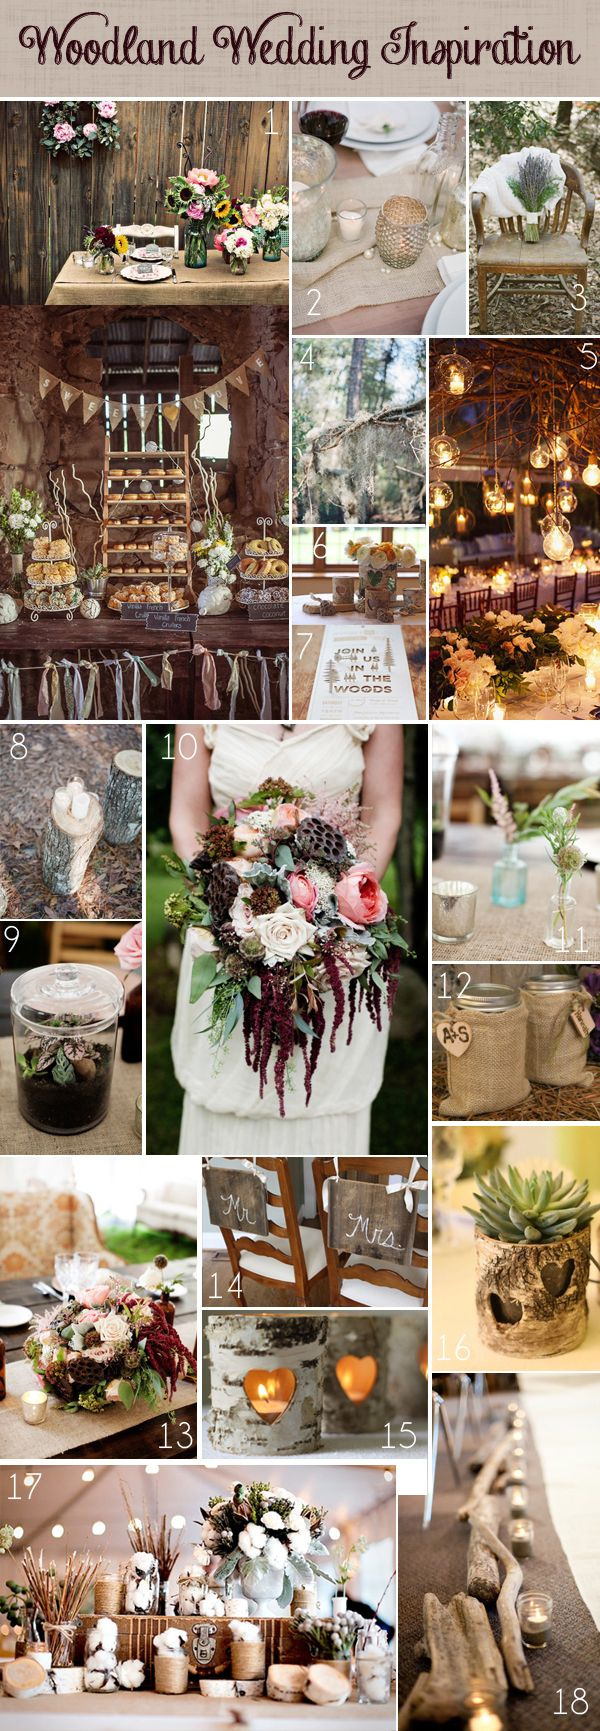 Woodland Wedding Ideas Wedding Tables Table Decorations